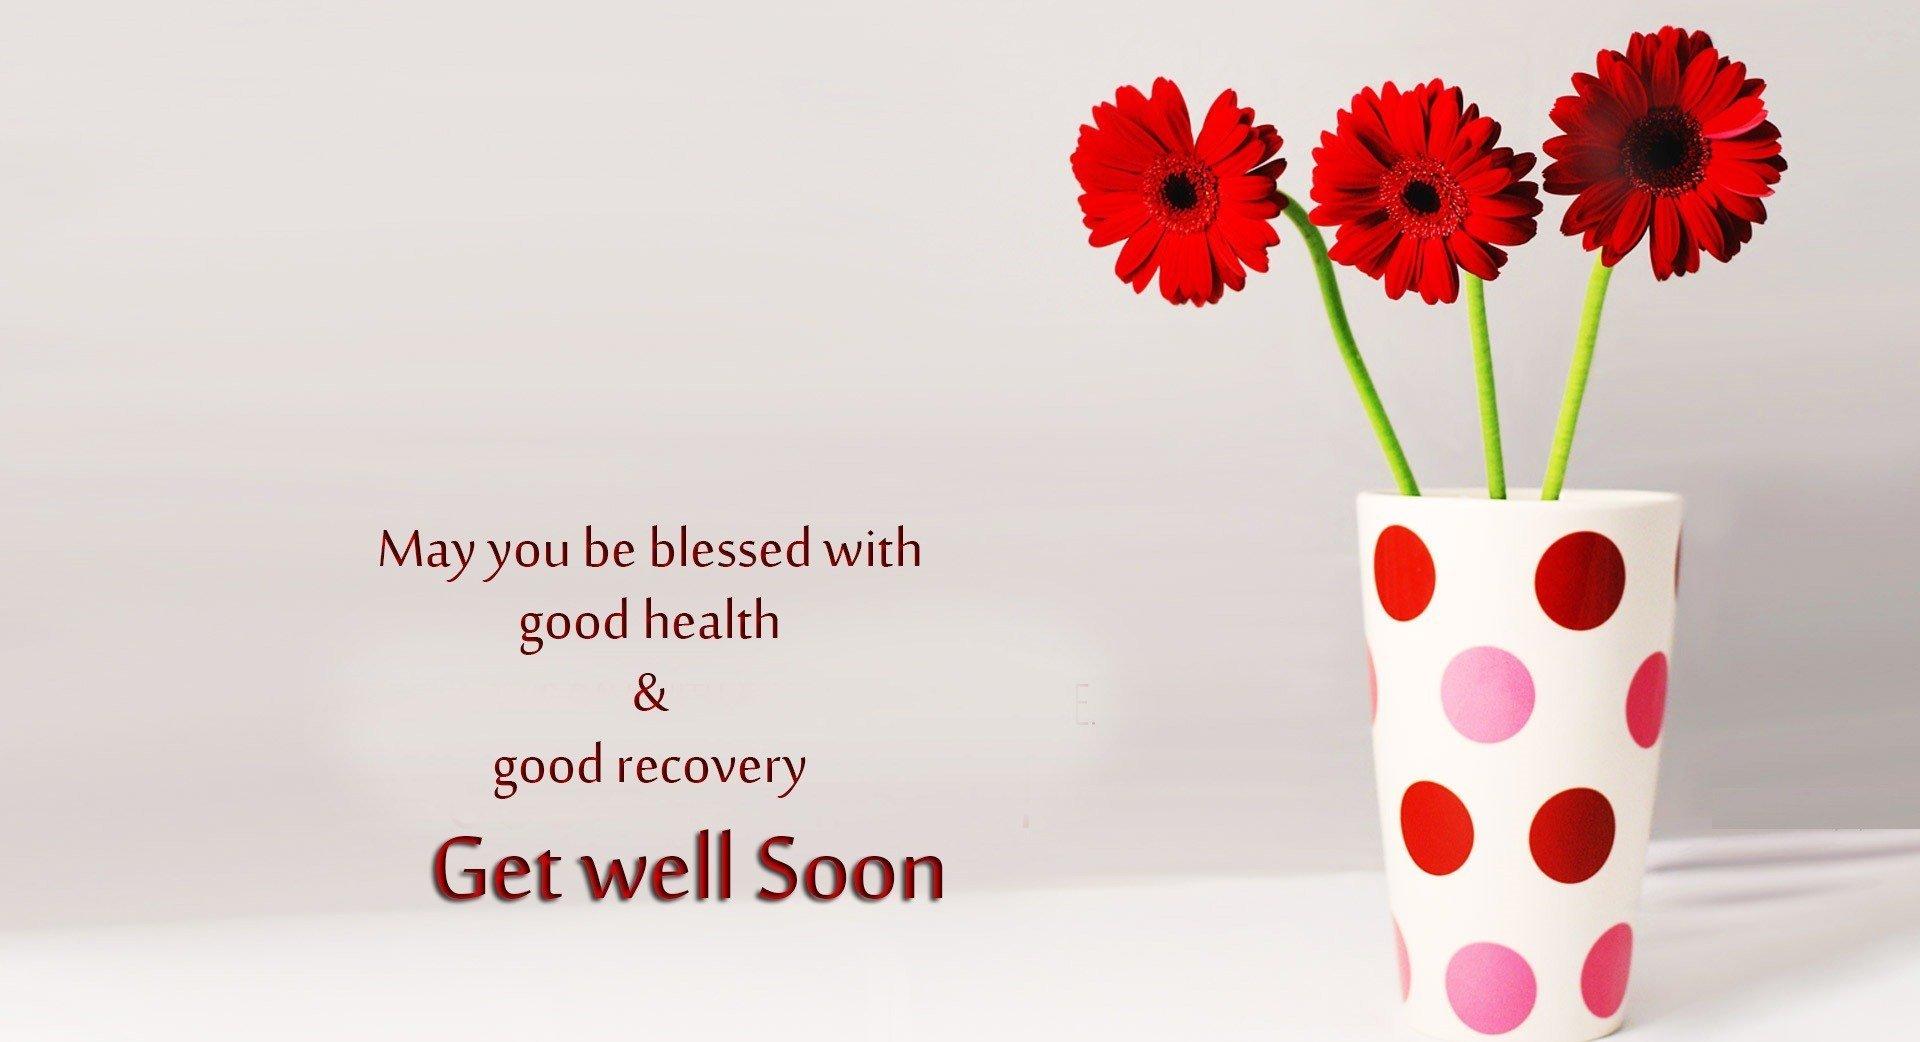 Get Well Soon Sir